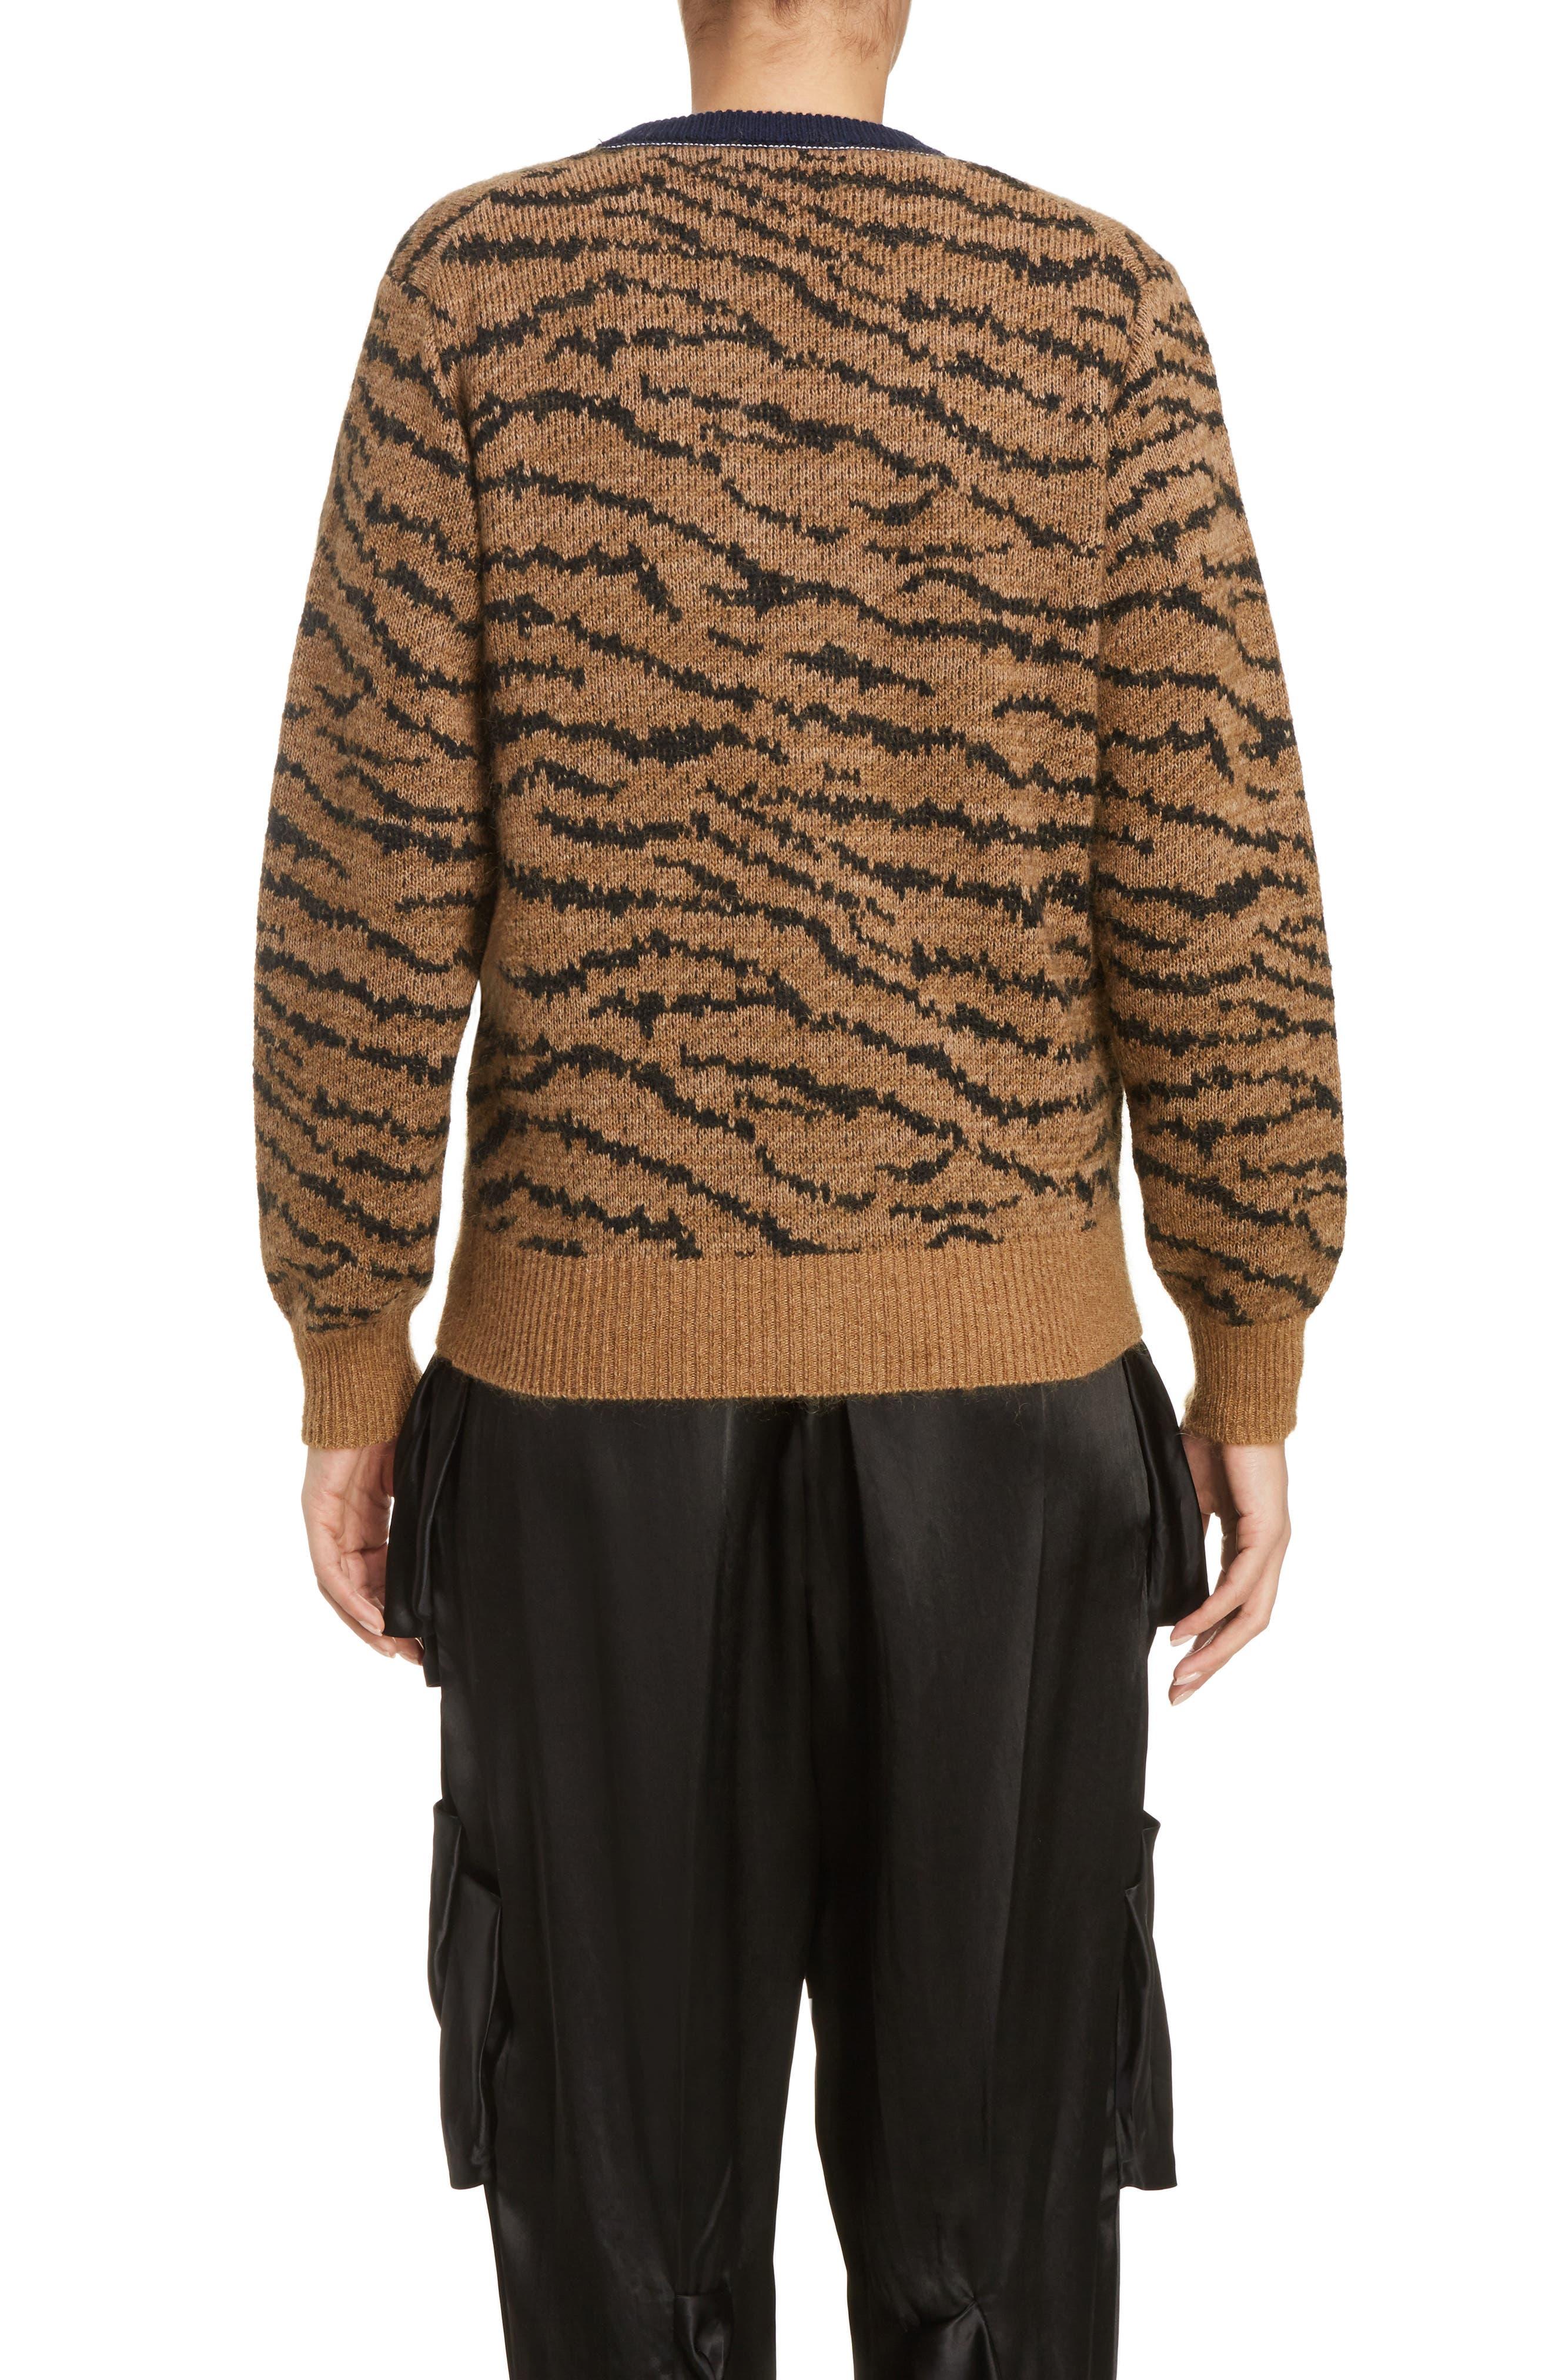 Tiger Jacquard Knit Button Cardigan,                             Alternate thumbnail 2, color,                             250